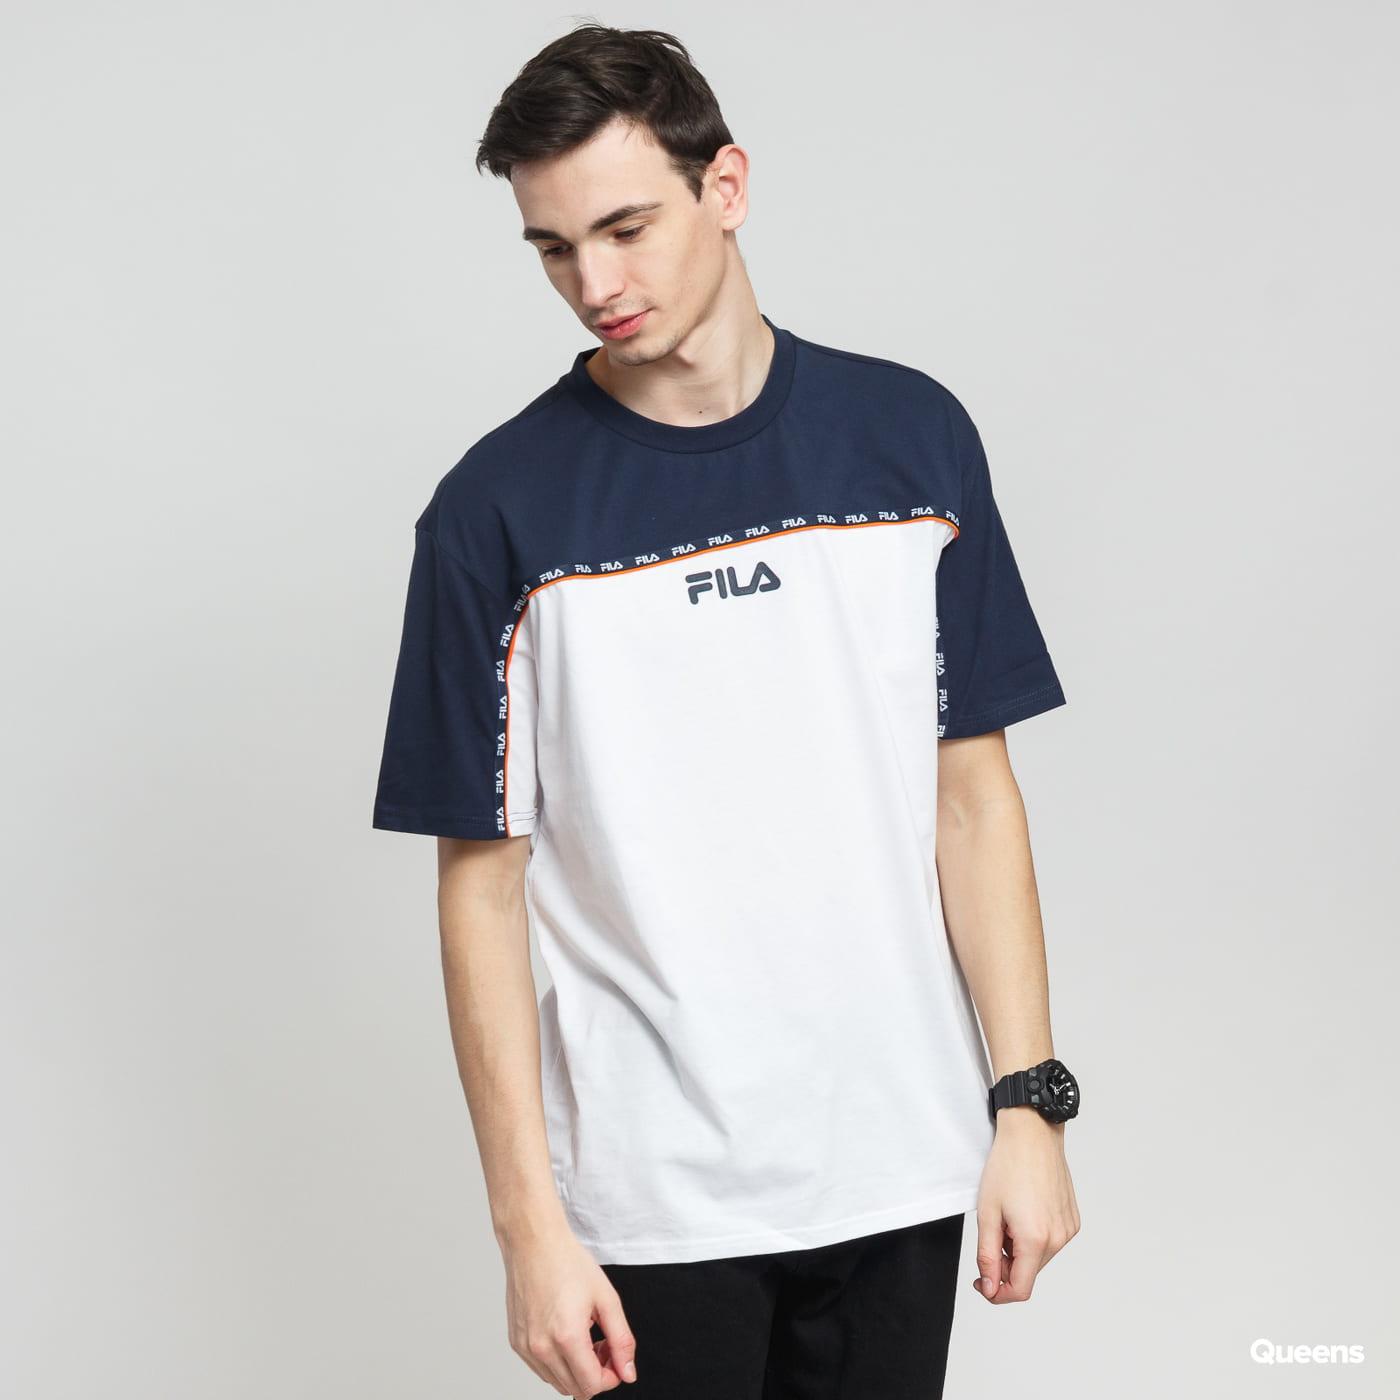 63b296c3 Short Sleeve T-Shirts Fila Men DSTR97 Tee white / navy / orange (687117  G13) – Queens 💚